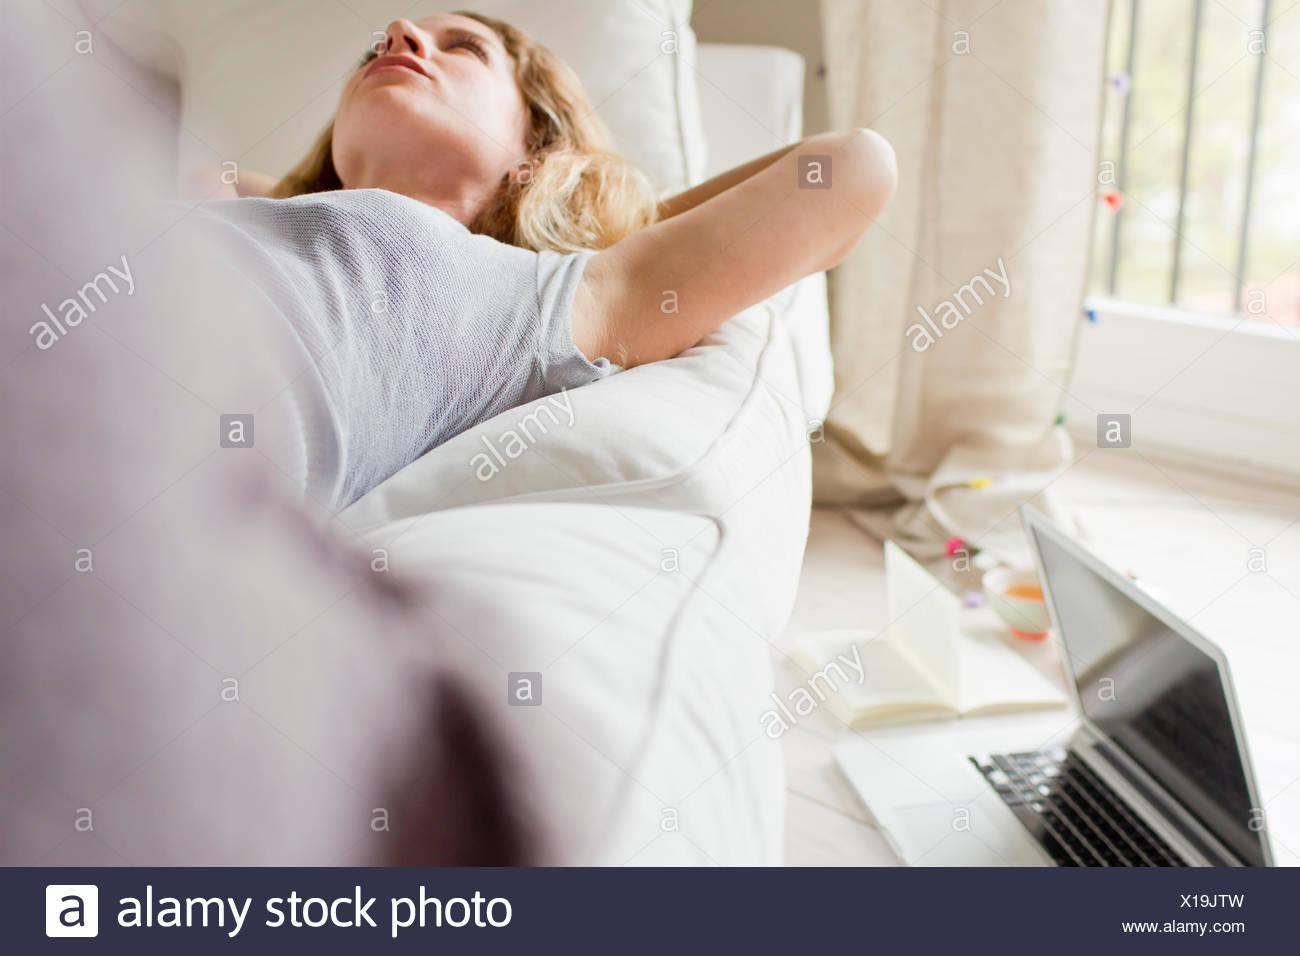 Frau liegt auf dem Sofa Tagträumen Stockbild